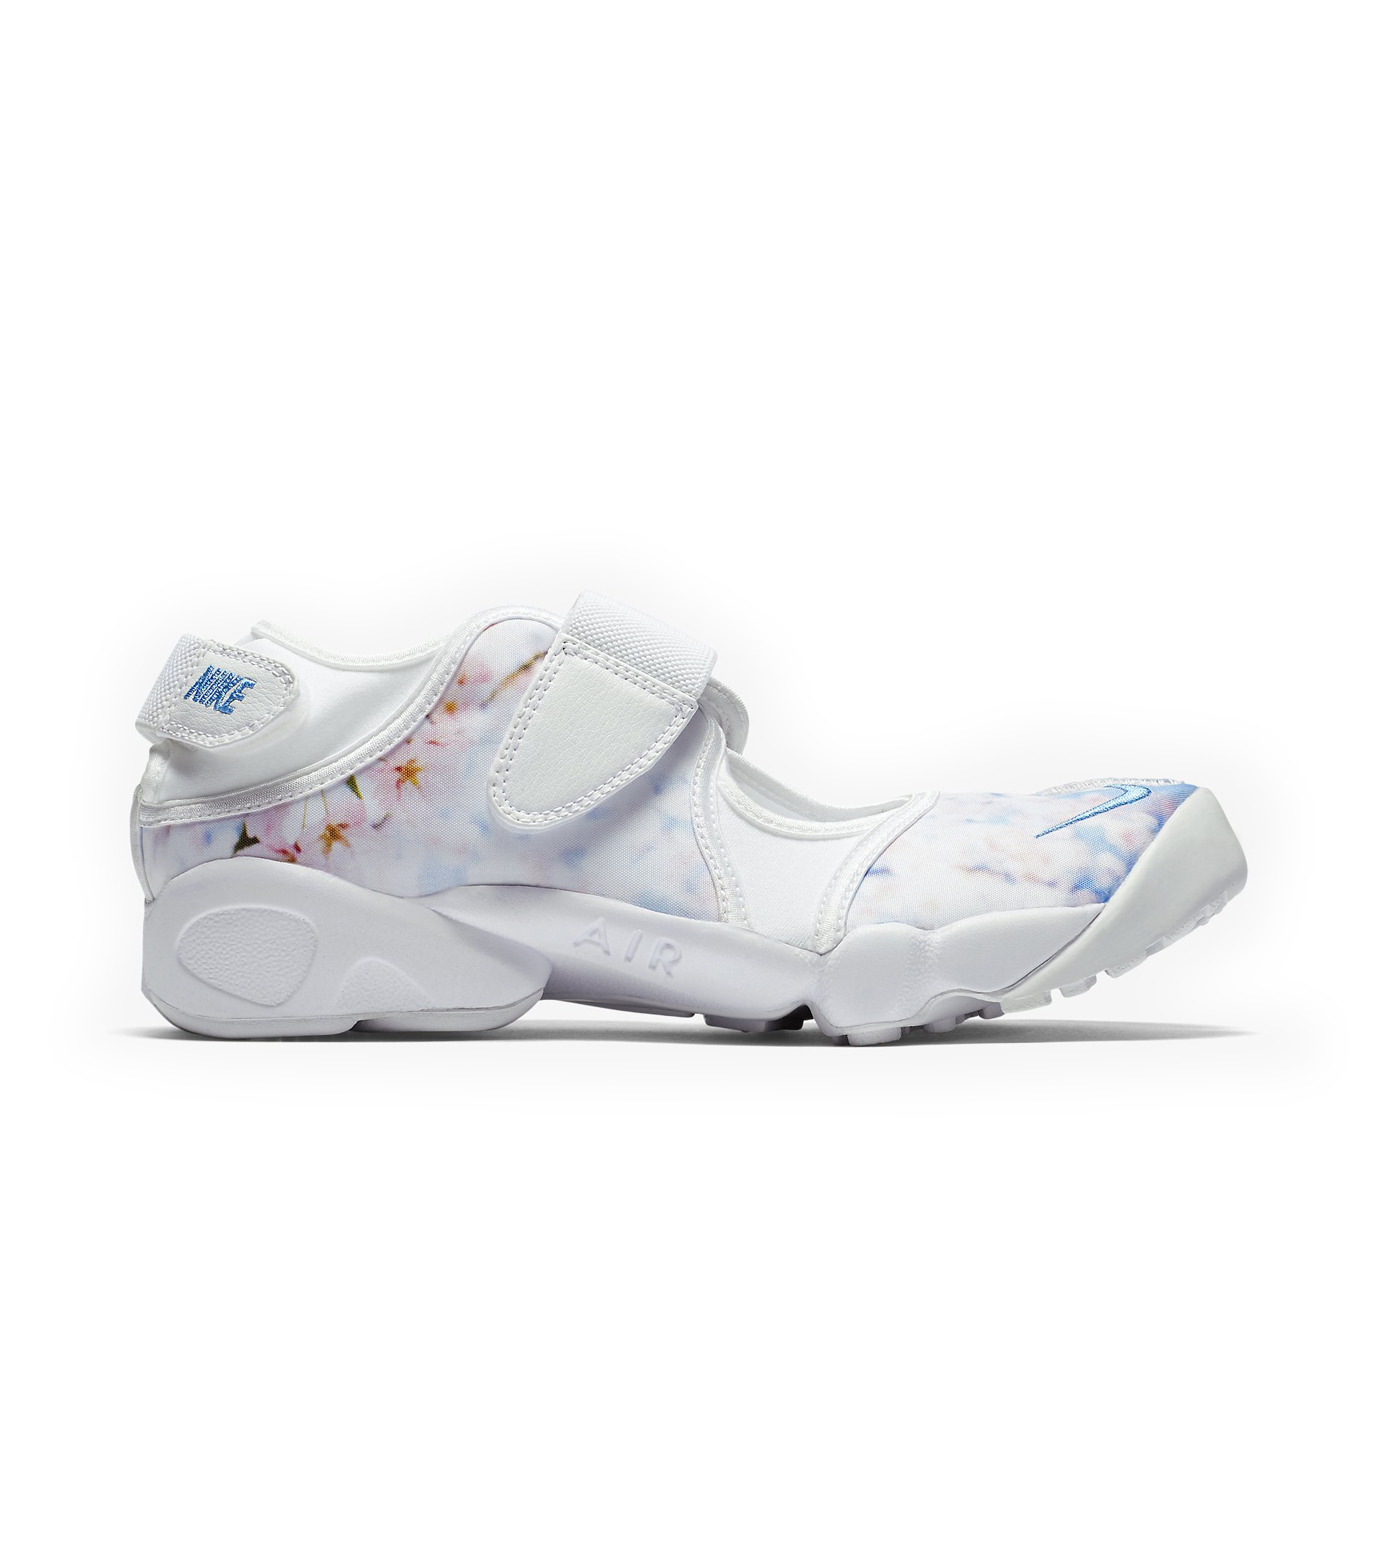 NIKE(ナイキ)のAIR RIFT PRINT-WHITE(シューズ/shoes)-807398-101-4 拡大詳細画像1